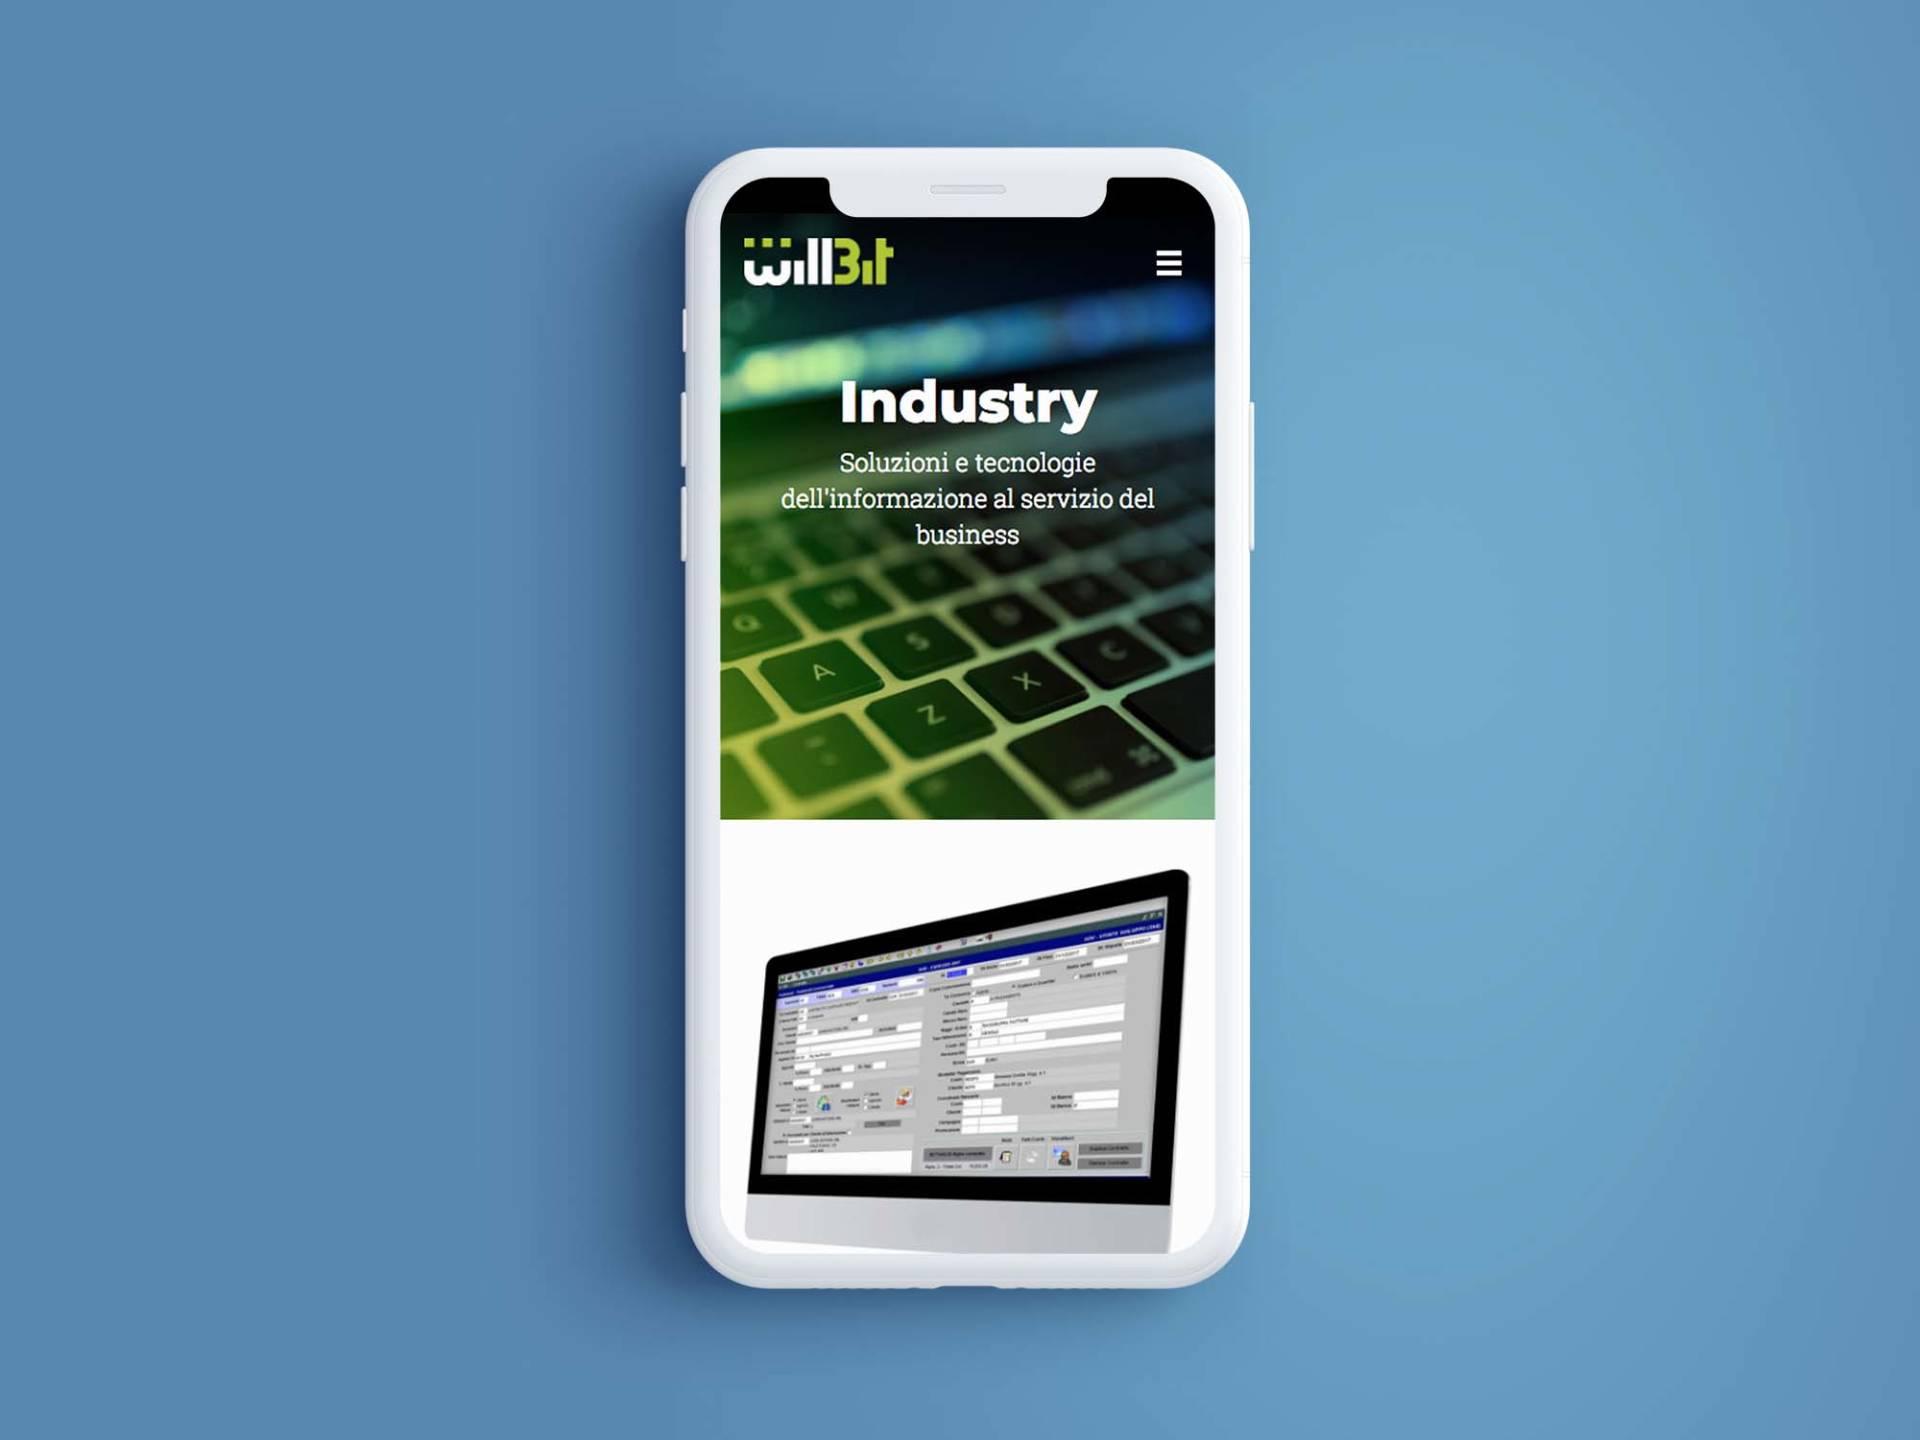 WillBit_08_Wenceslau_News_Design